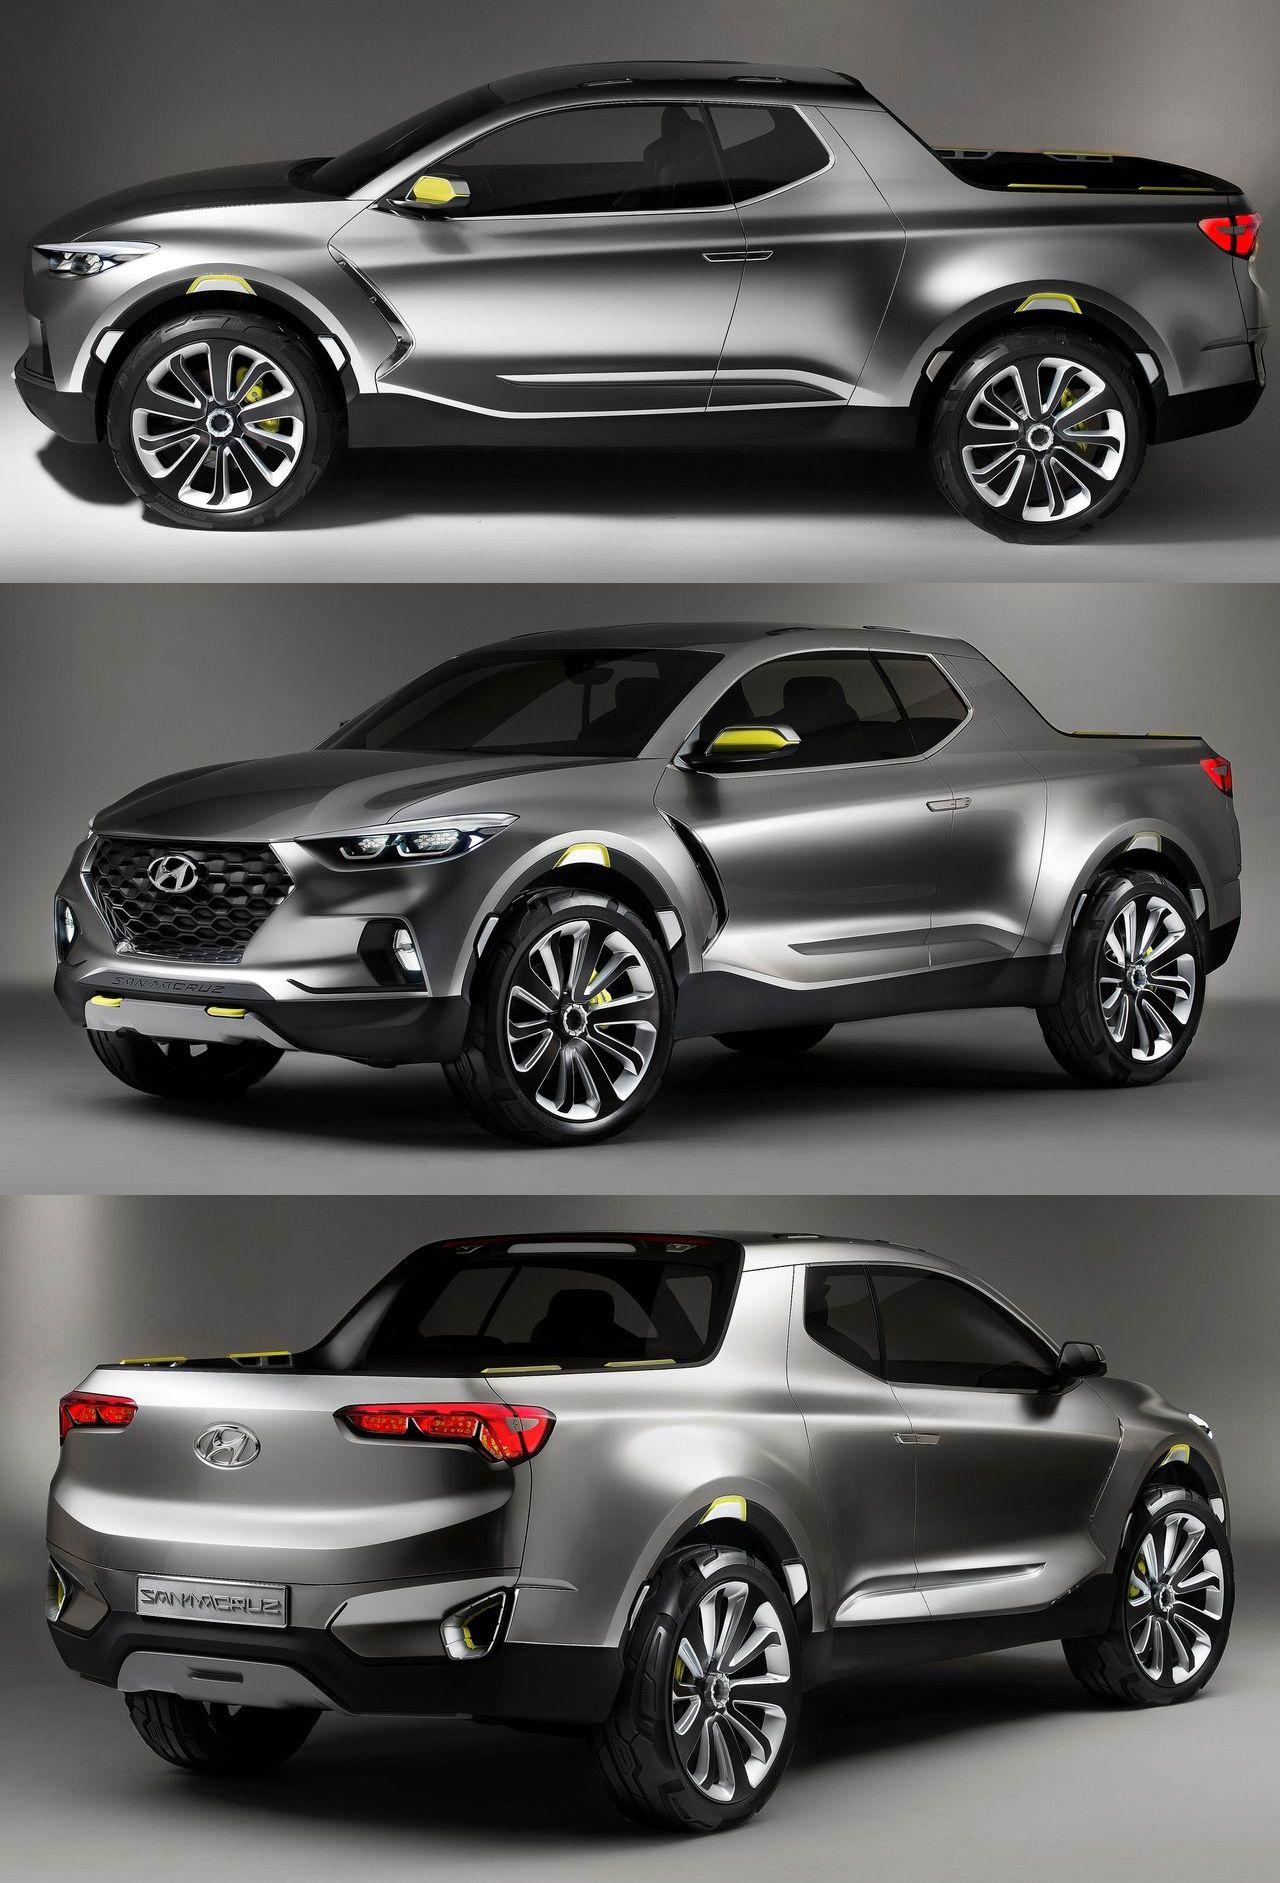 Hyundai Santa Cruz Crossover Truck Concept Design Autos Dacia Sportwagen Futuristic Cars